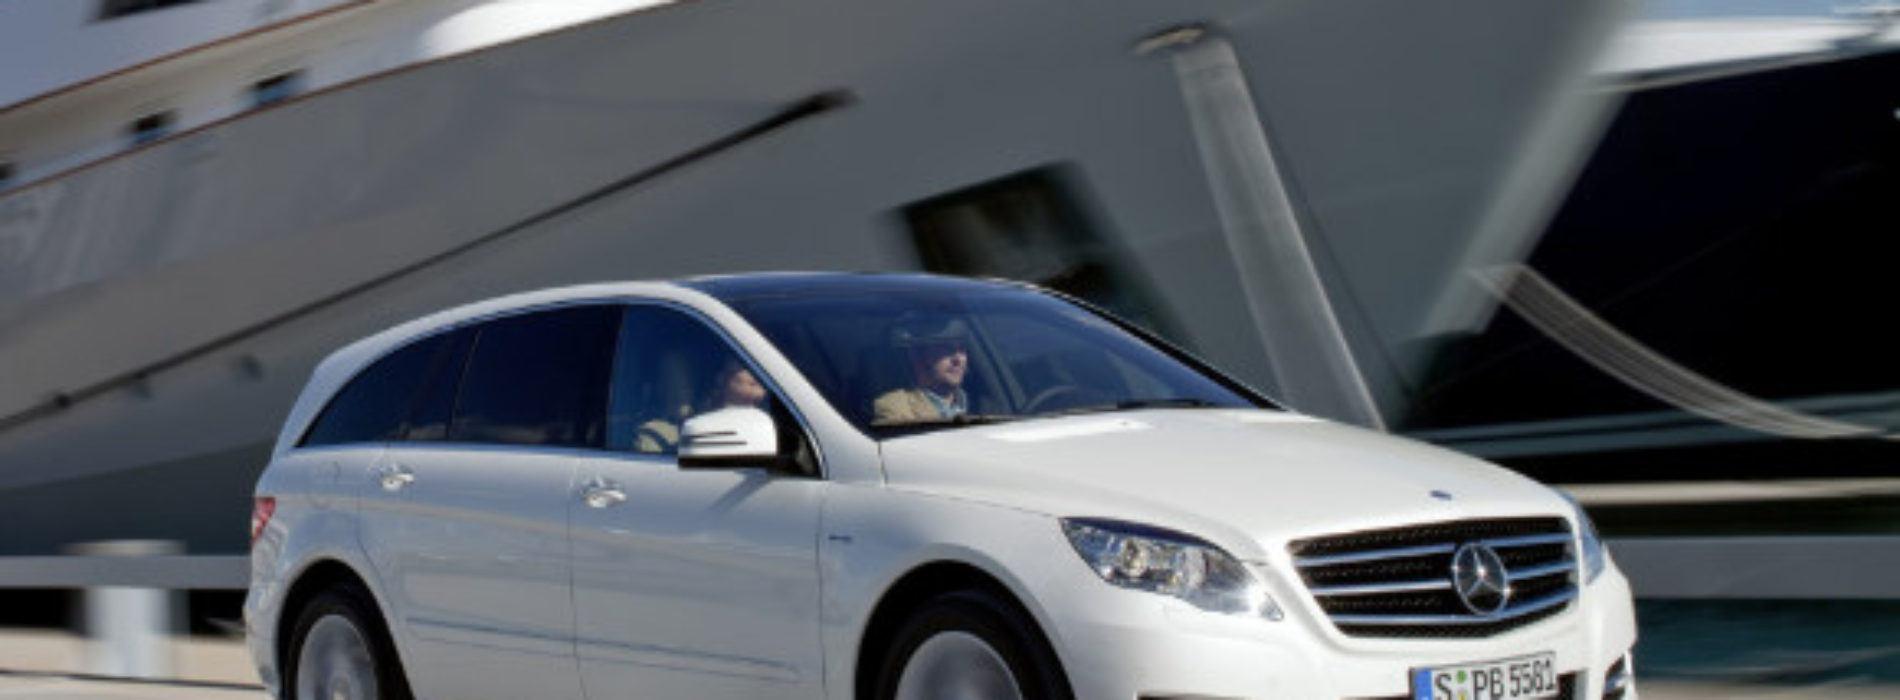 Nuevo modelo clase R, de Mercedes Benz